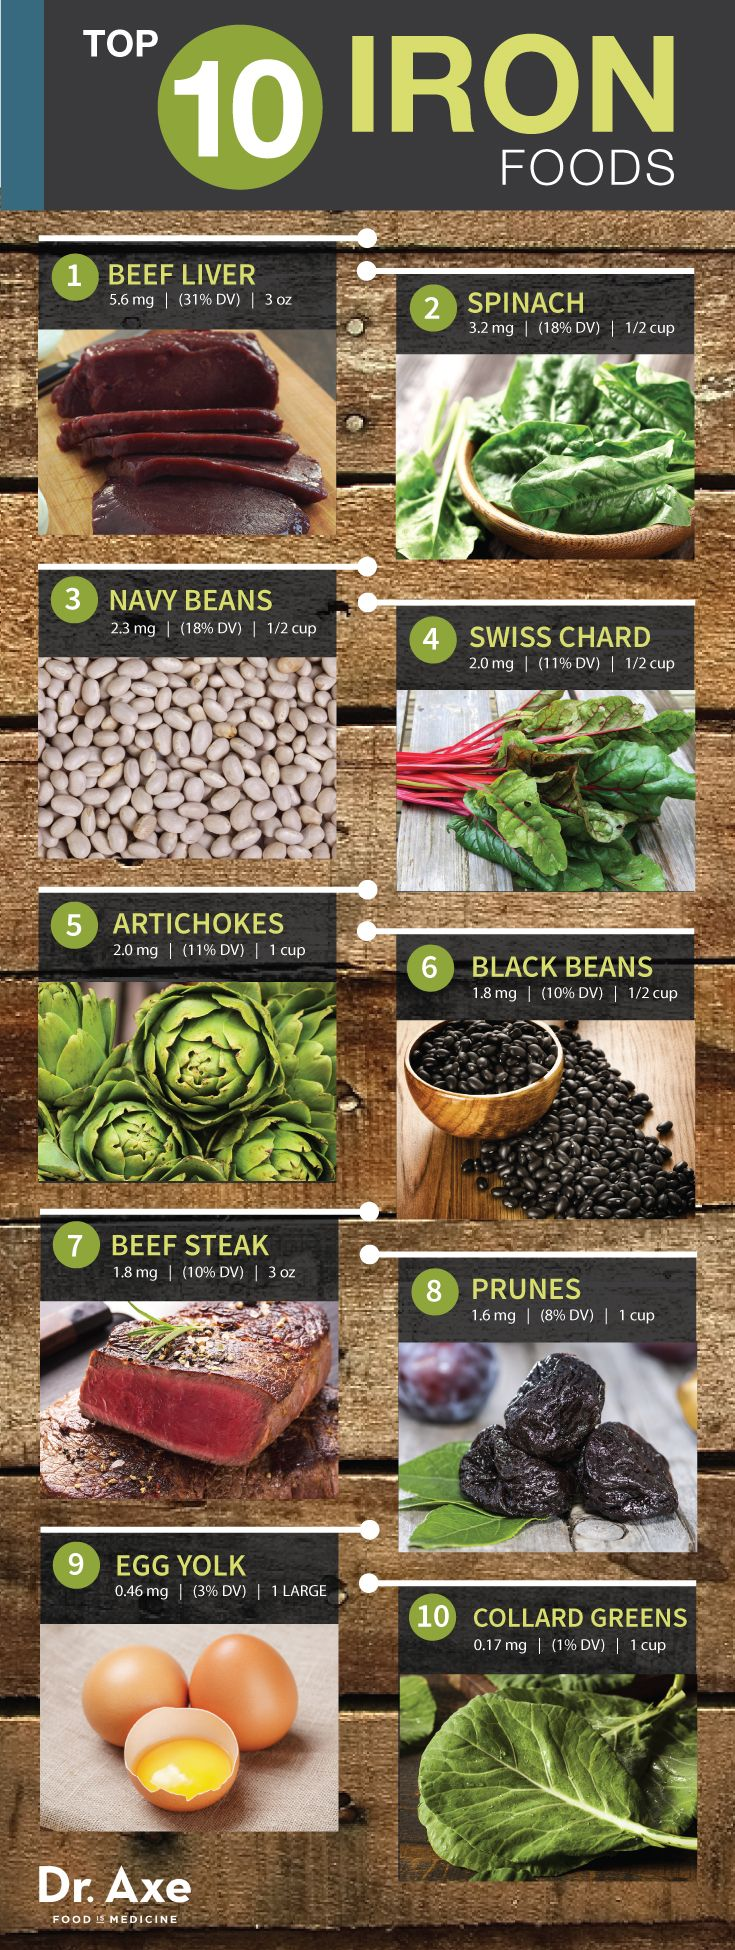 Top 10 Iron Rich Foods - DrAxe.com